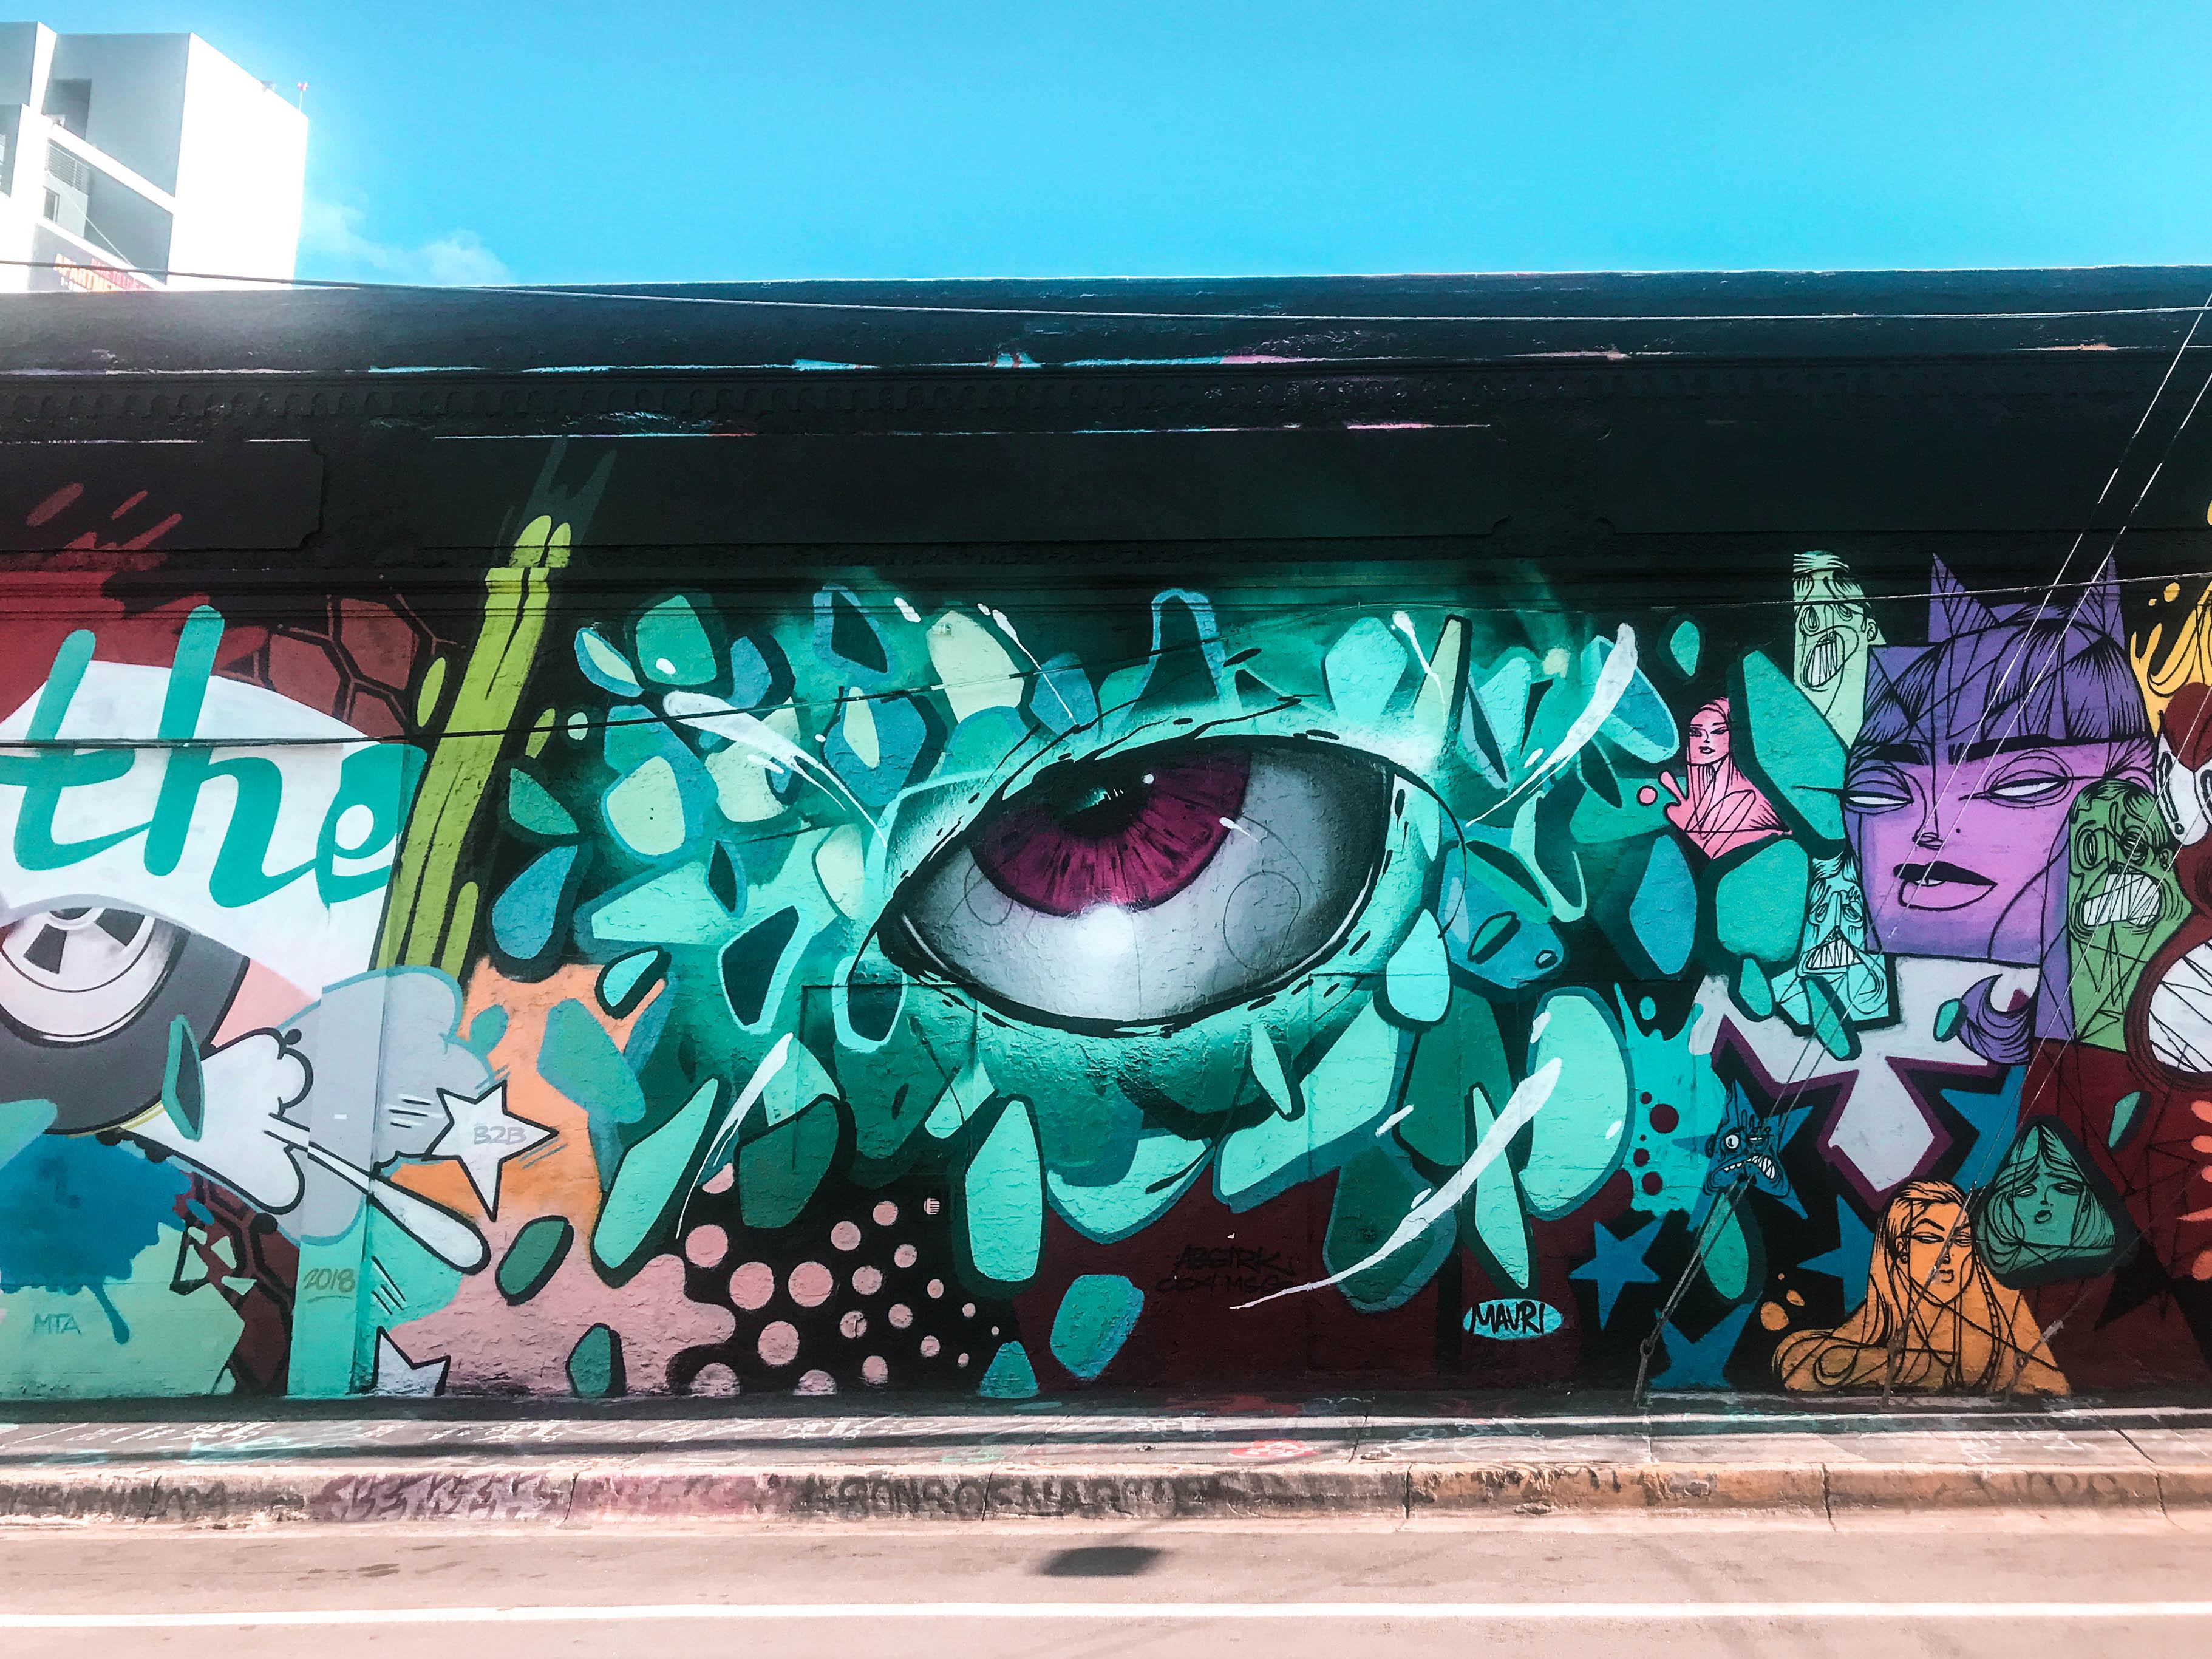 wynwood walls art district street art abstract art unique grafitti where to go in miami florida